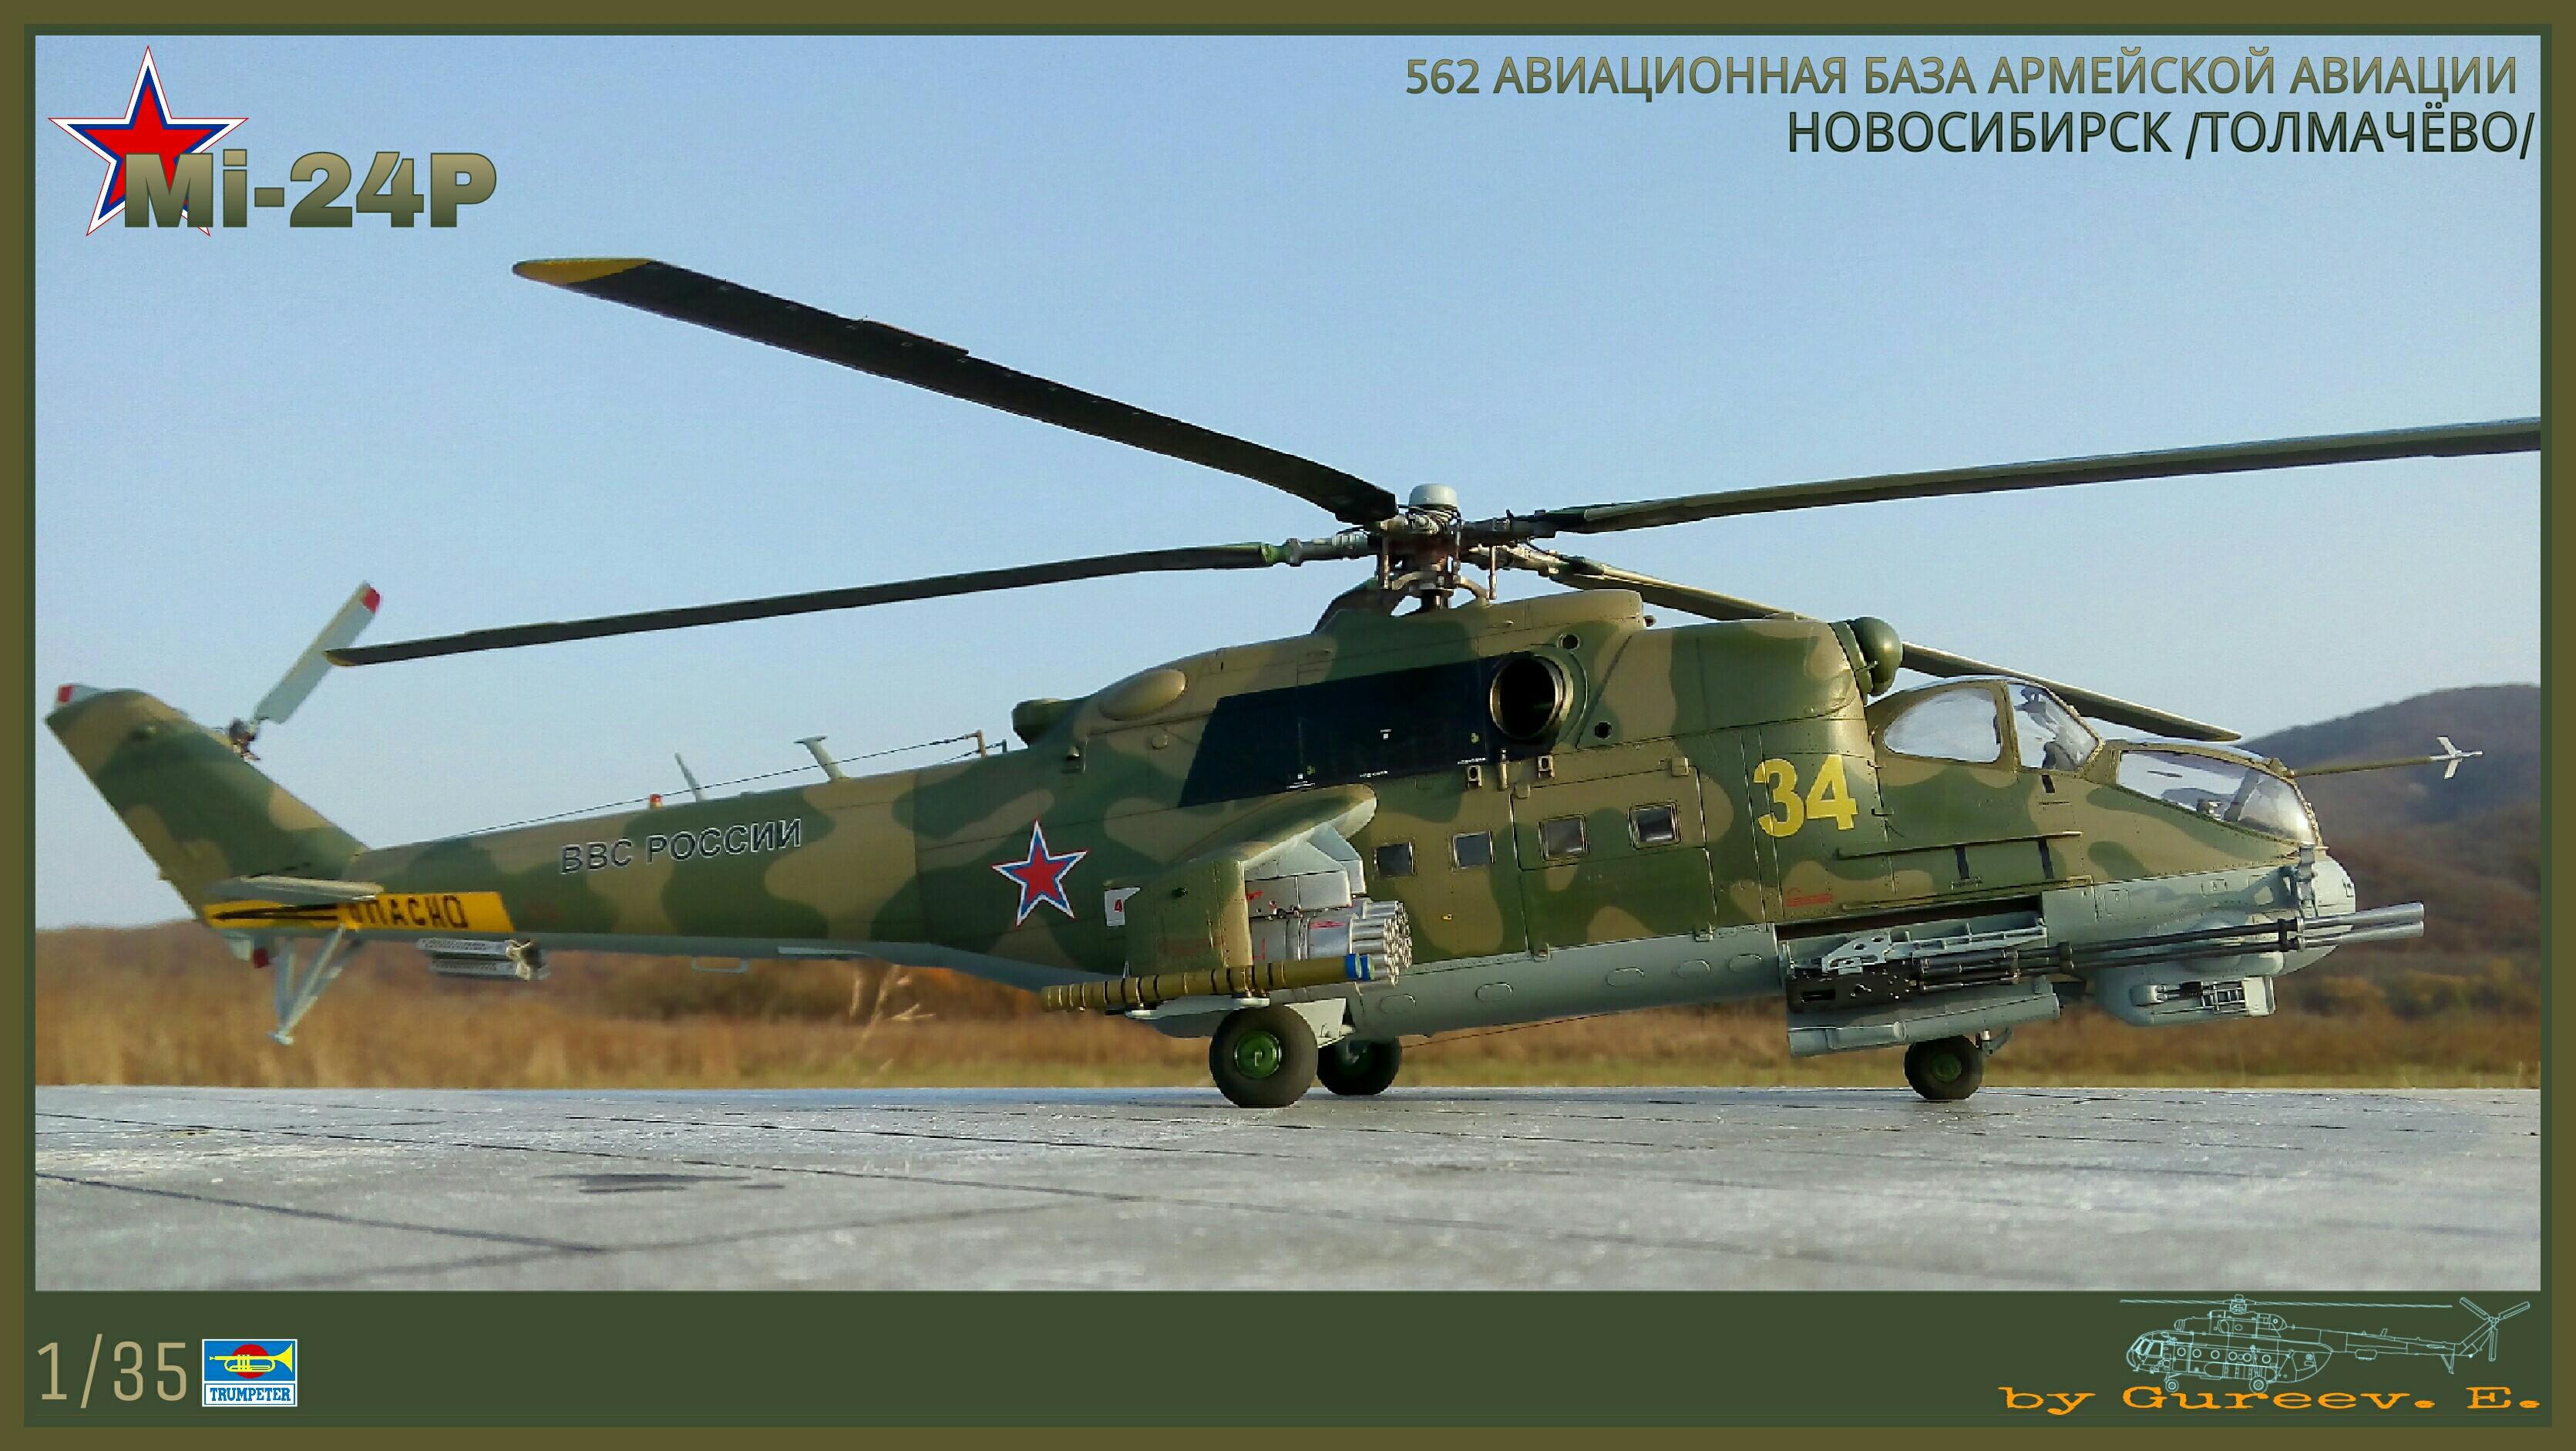 Ми-24П. Trumpeter. 1/35 8a2ba12be1c4